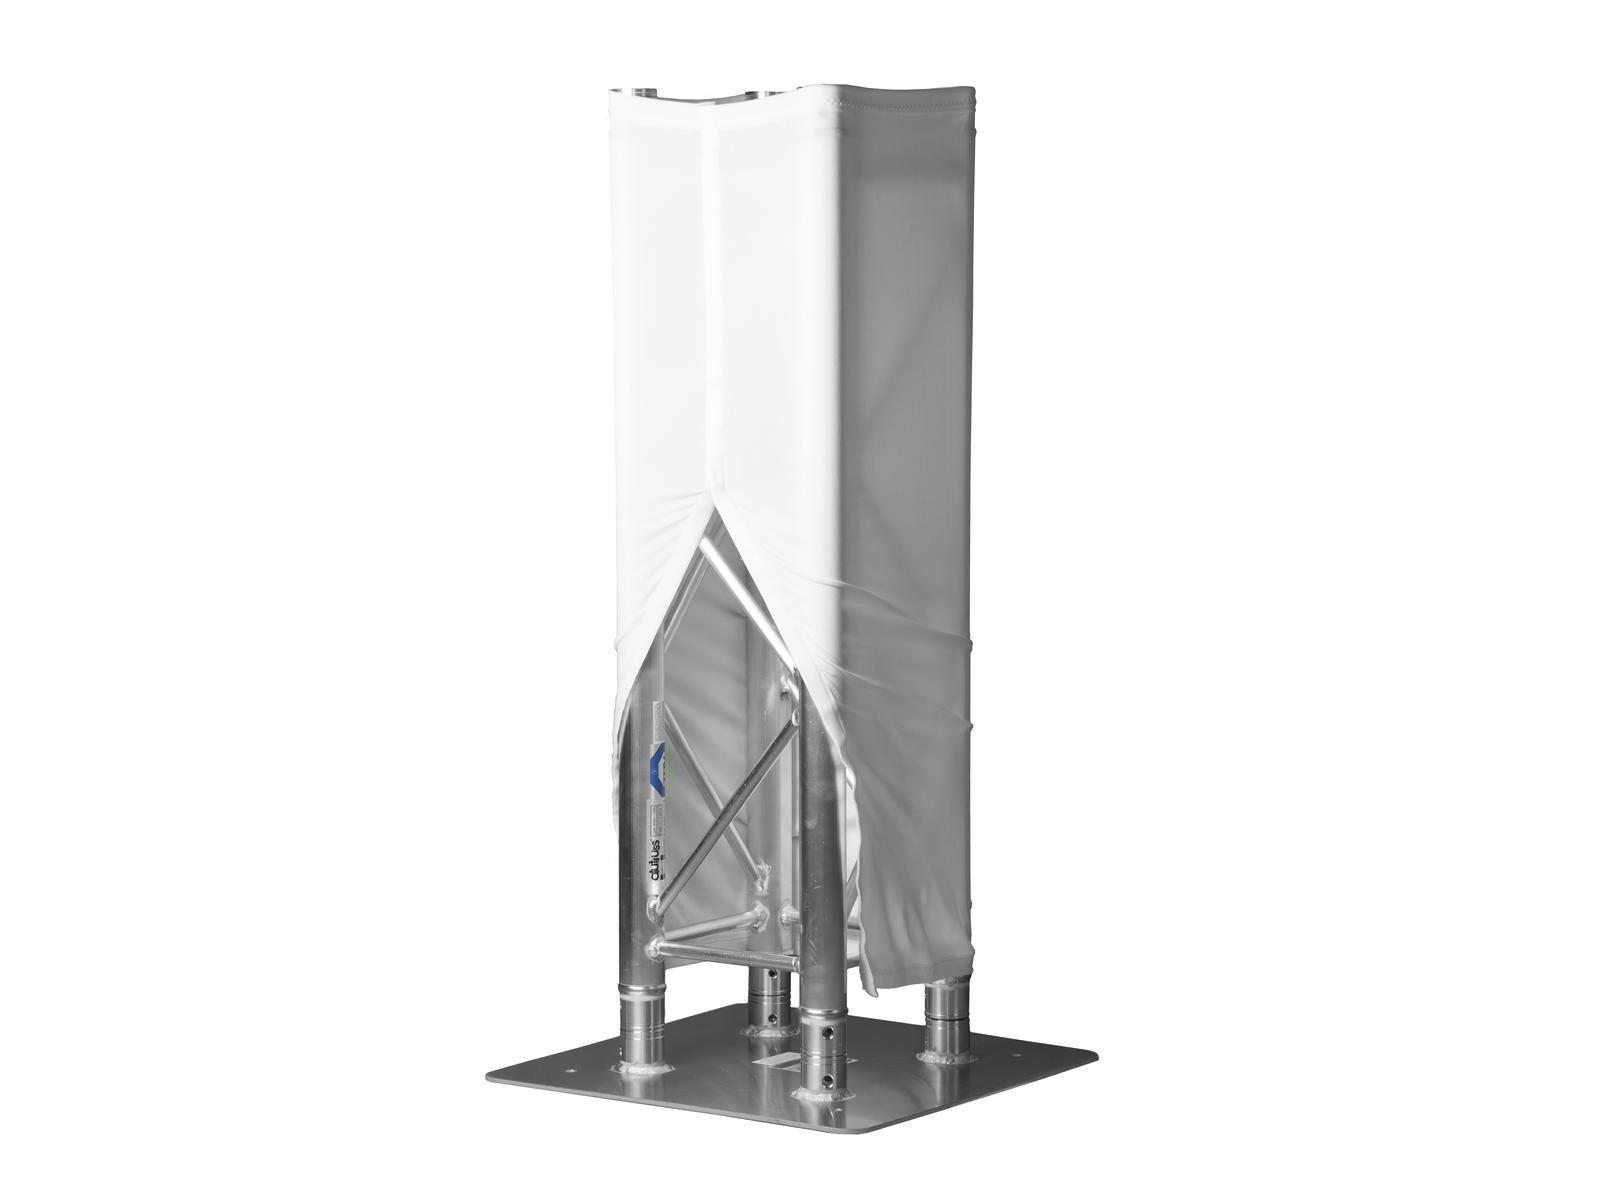 ESPANDERE XPTC25KVW Capriata di copertura 250cm bianco